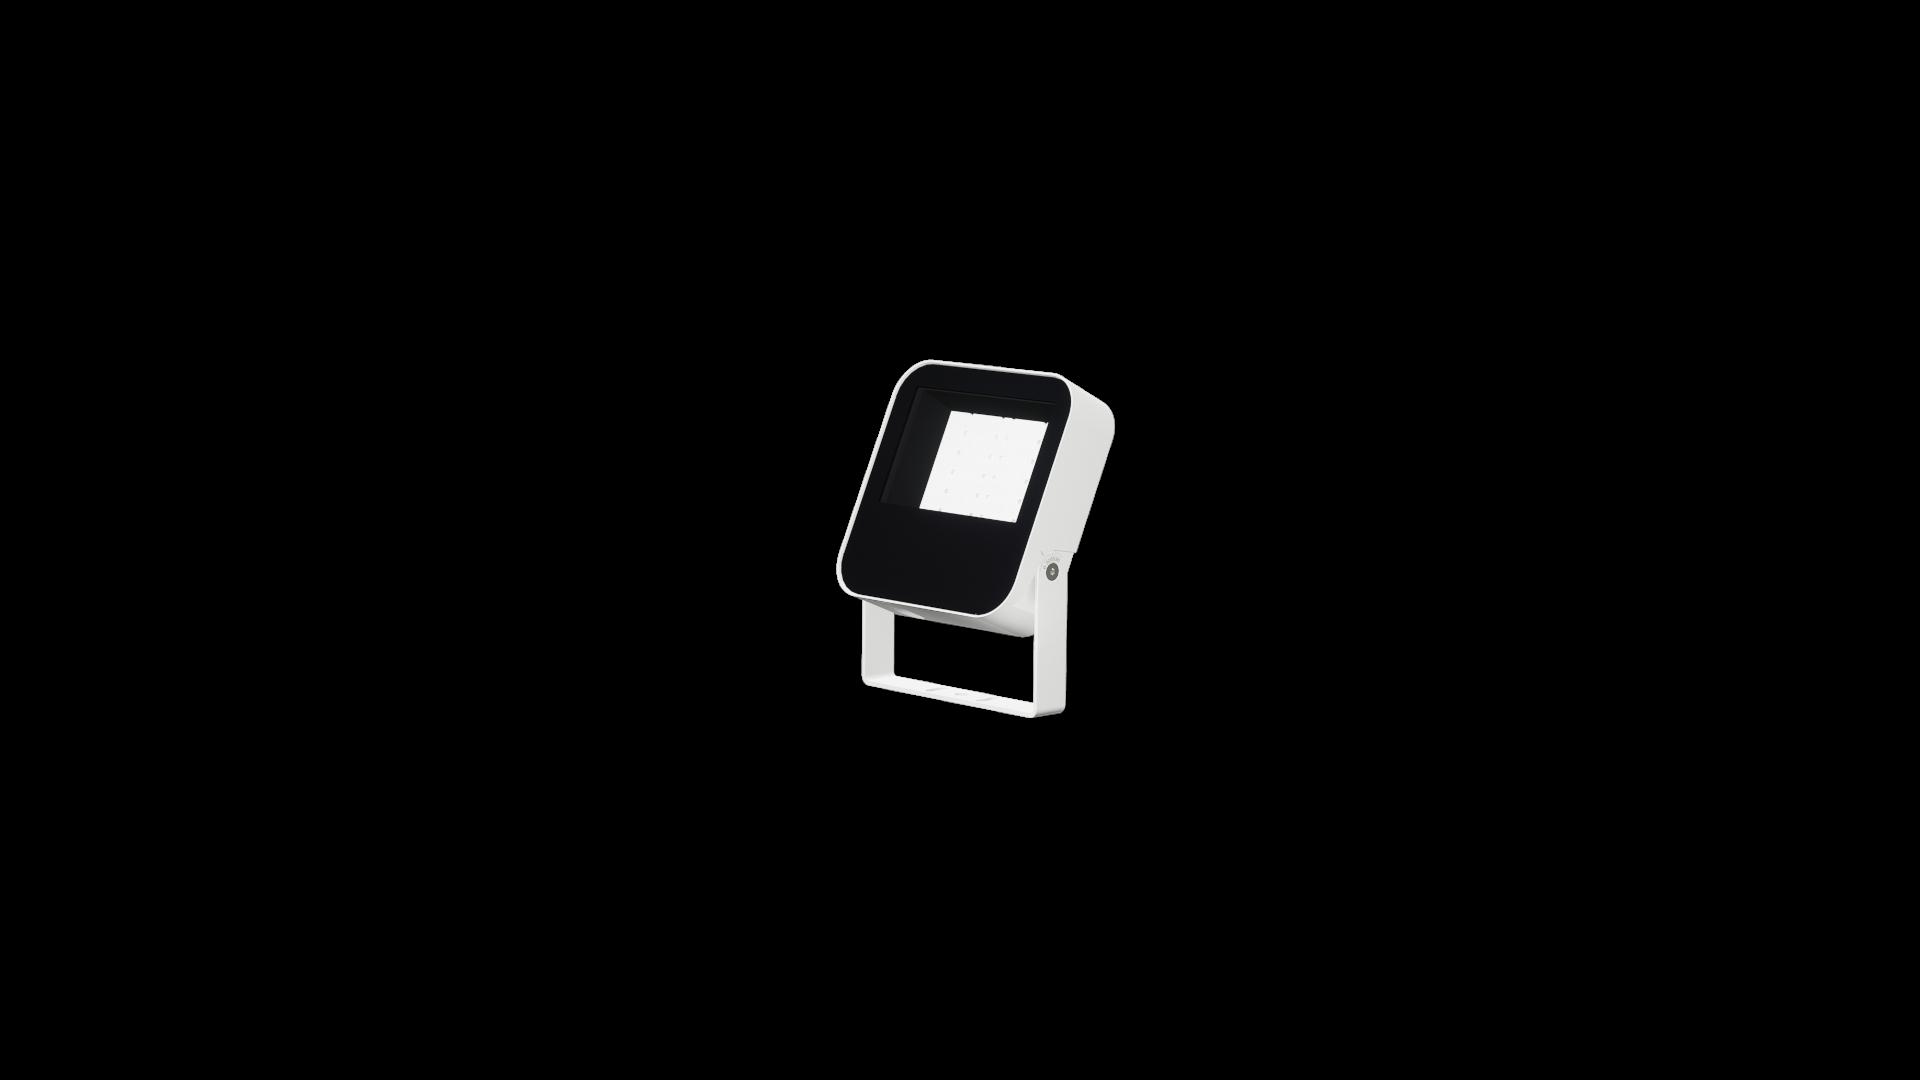 PHOCUX QL G25W TBLx11 XO con cierre transparente ReflectorNegro Blanco_HR_escala